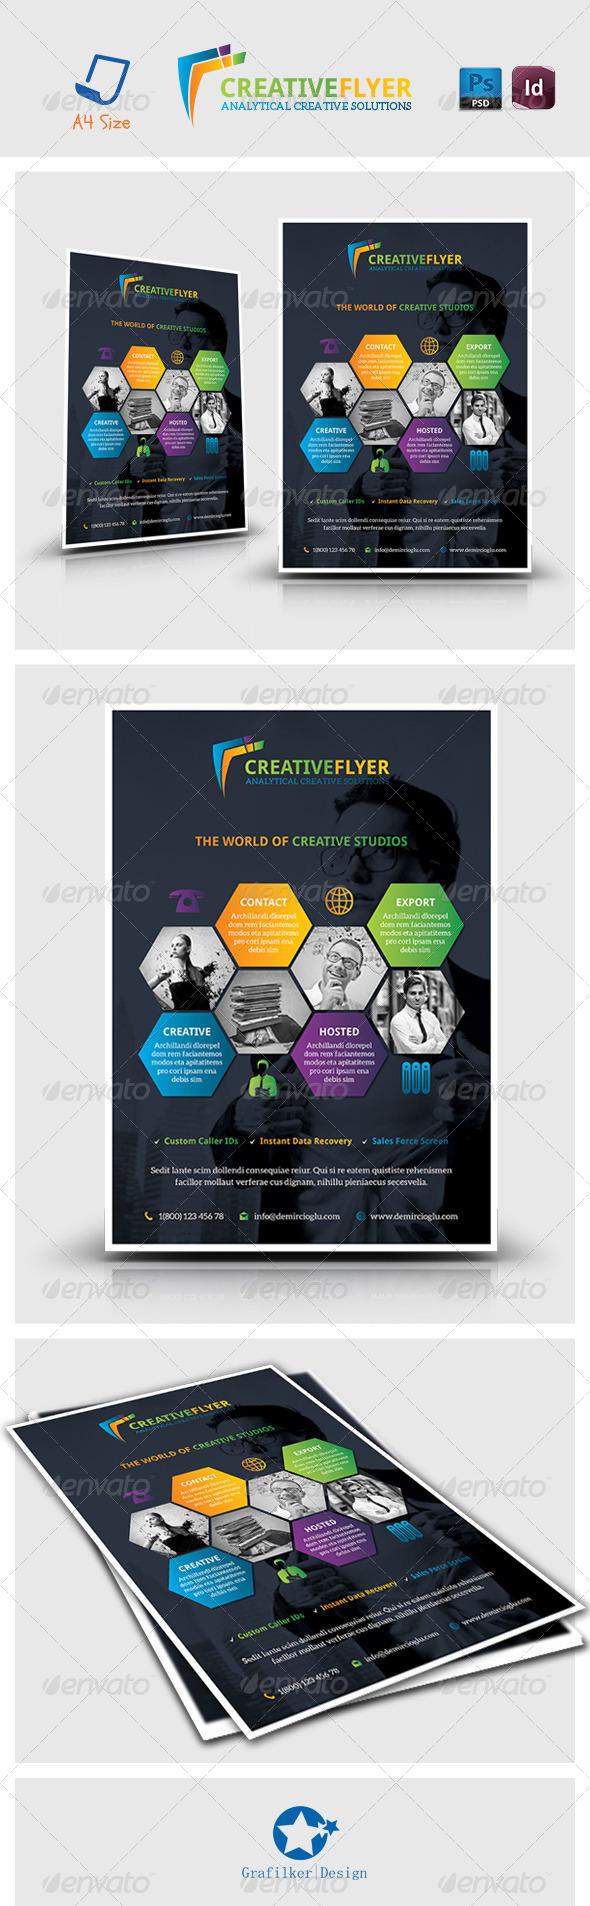 Creative Studio Flyer Templates - Corporate Flyers